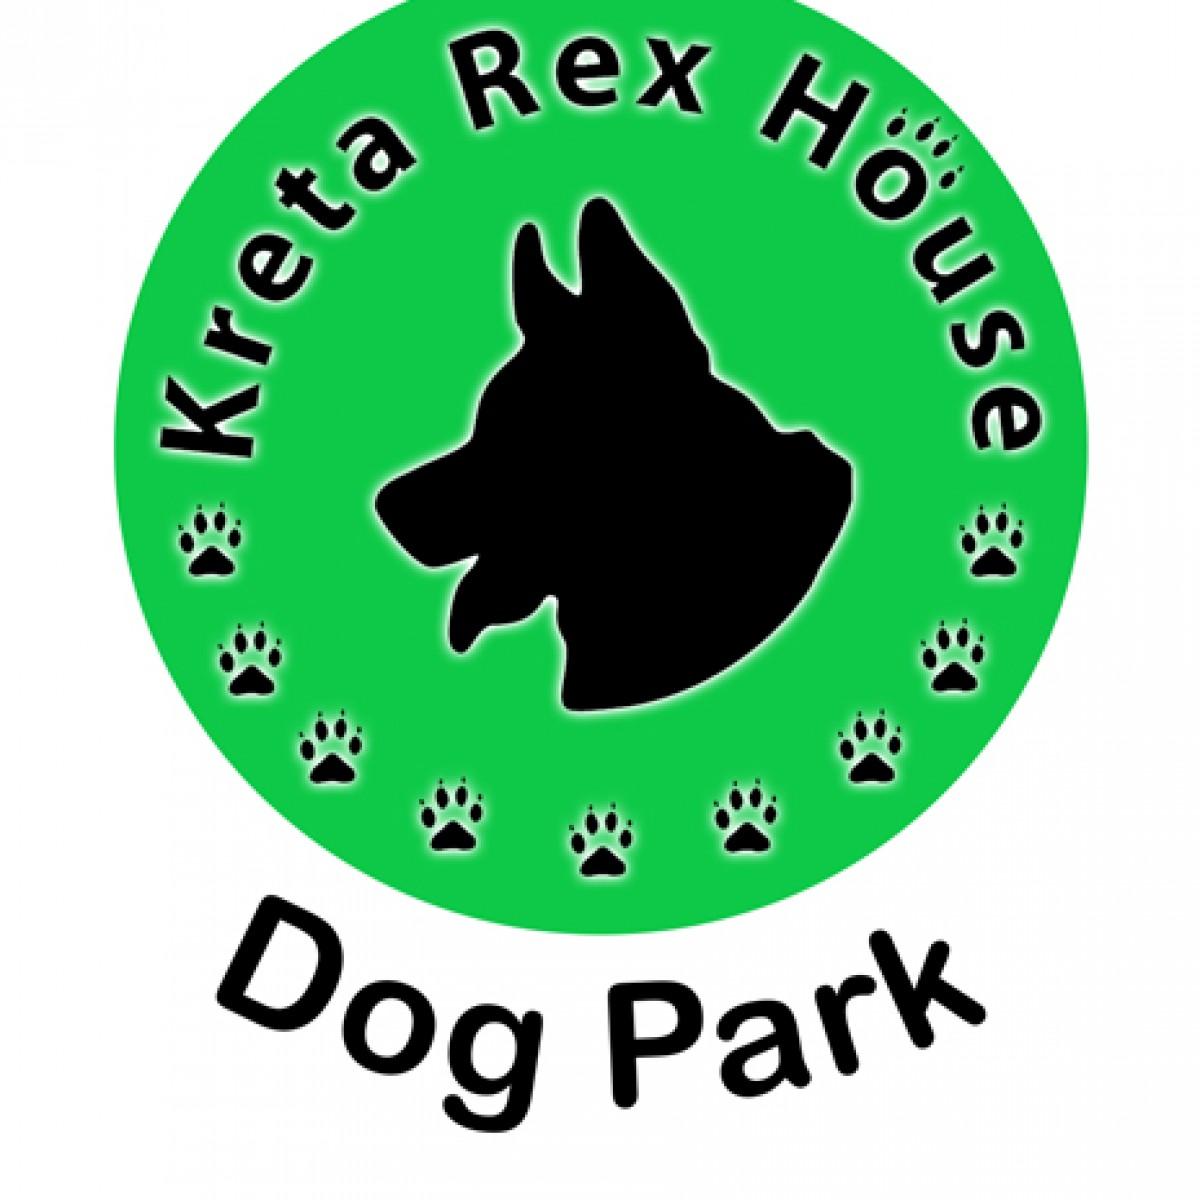 Dog Park από την Kreta Rex House